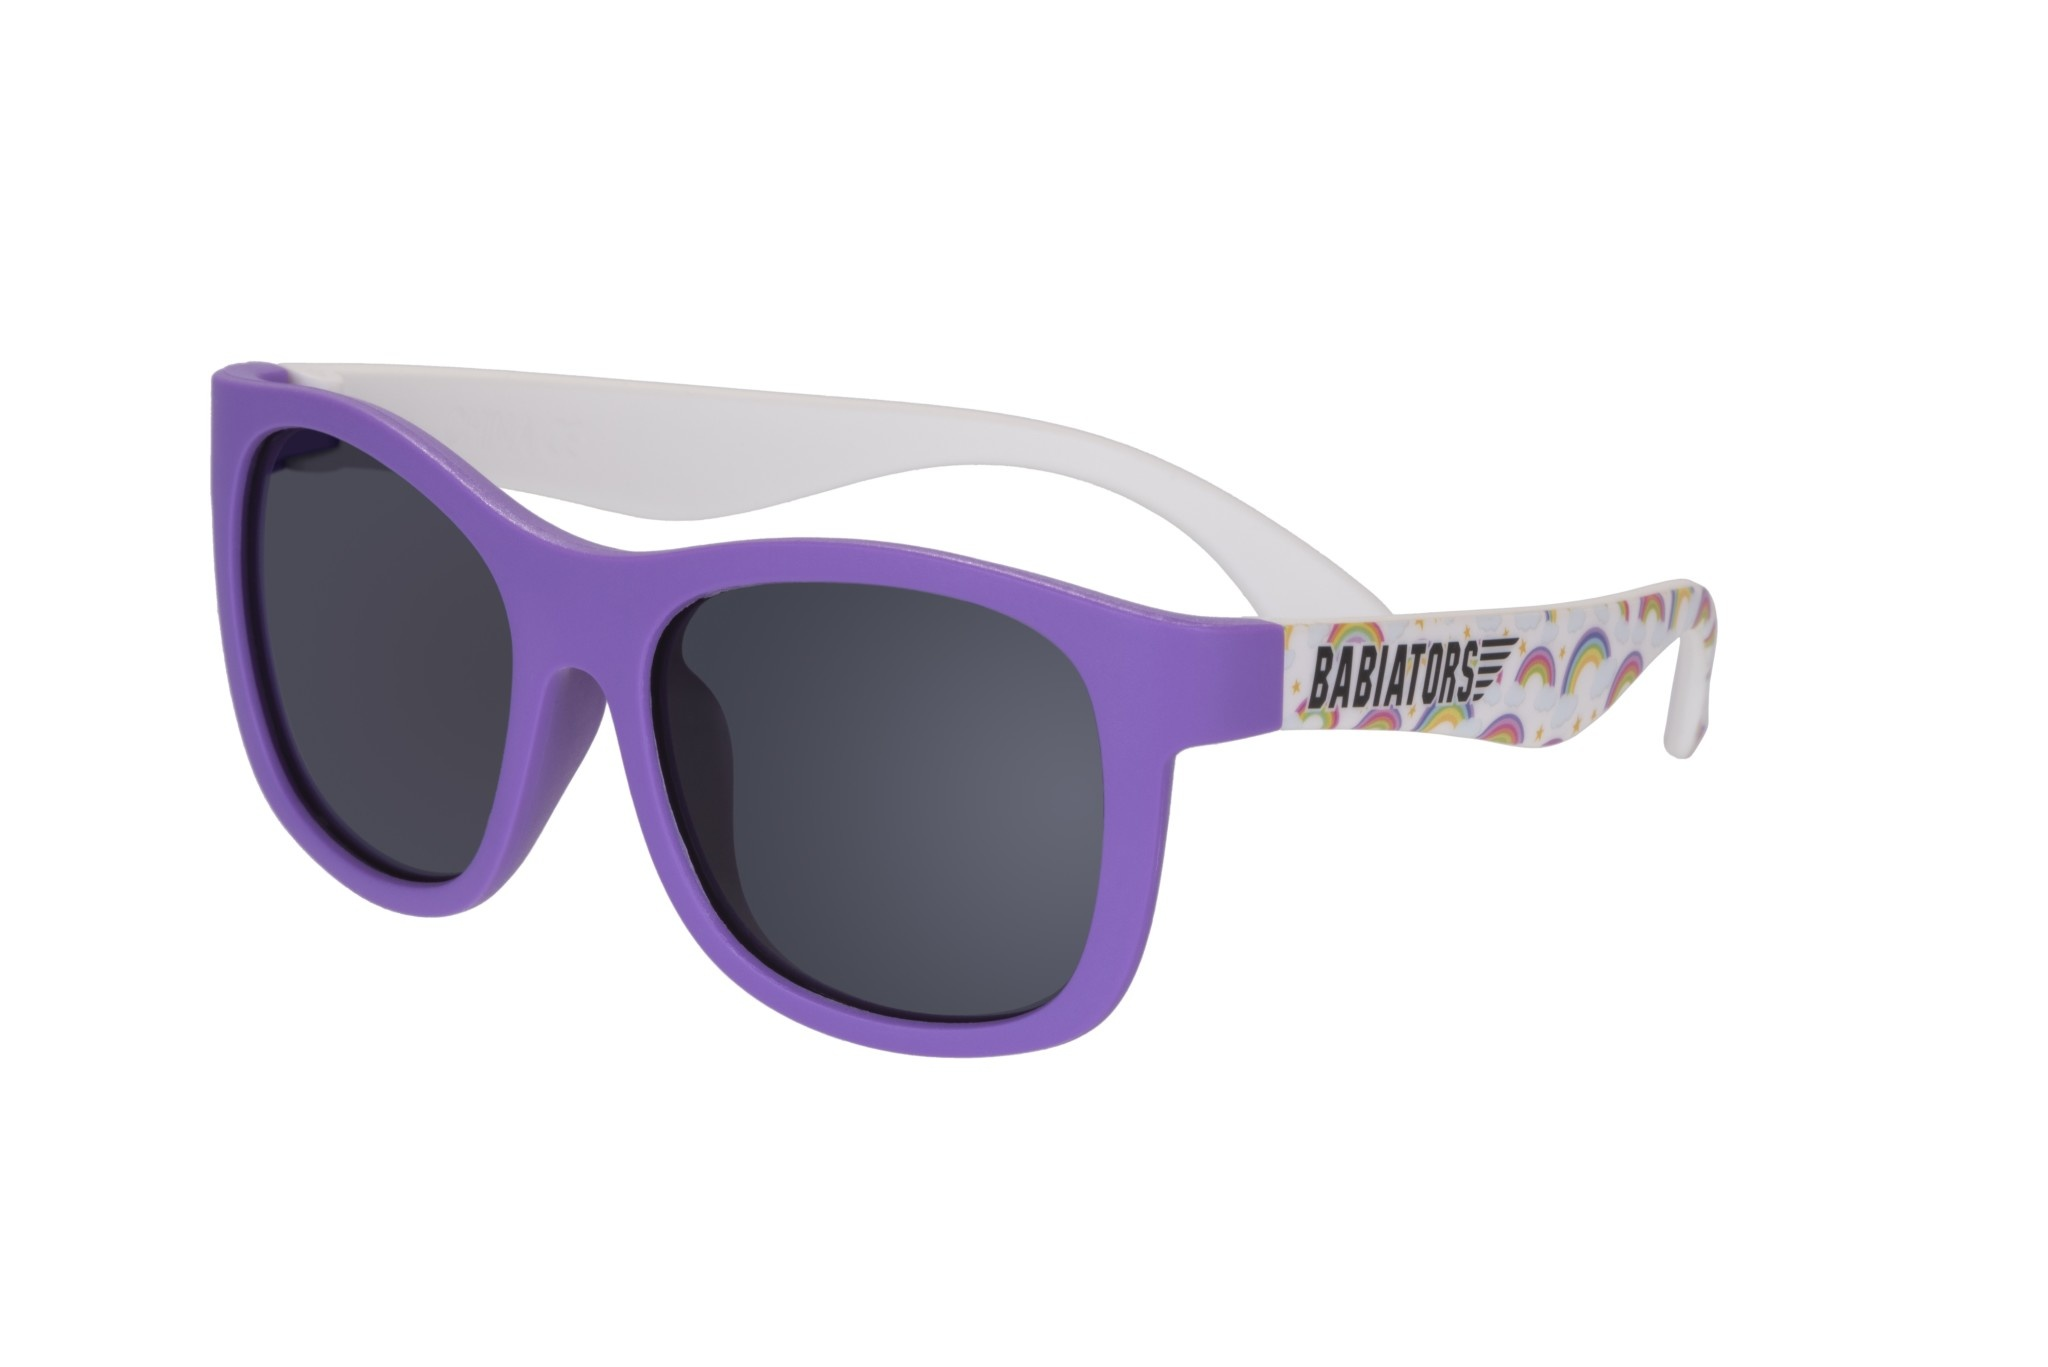 Limited Edition Navigator - Over the Rainbow Purple